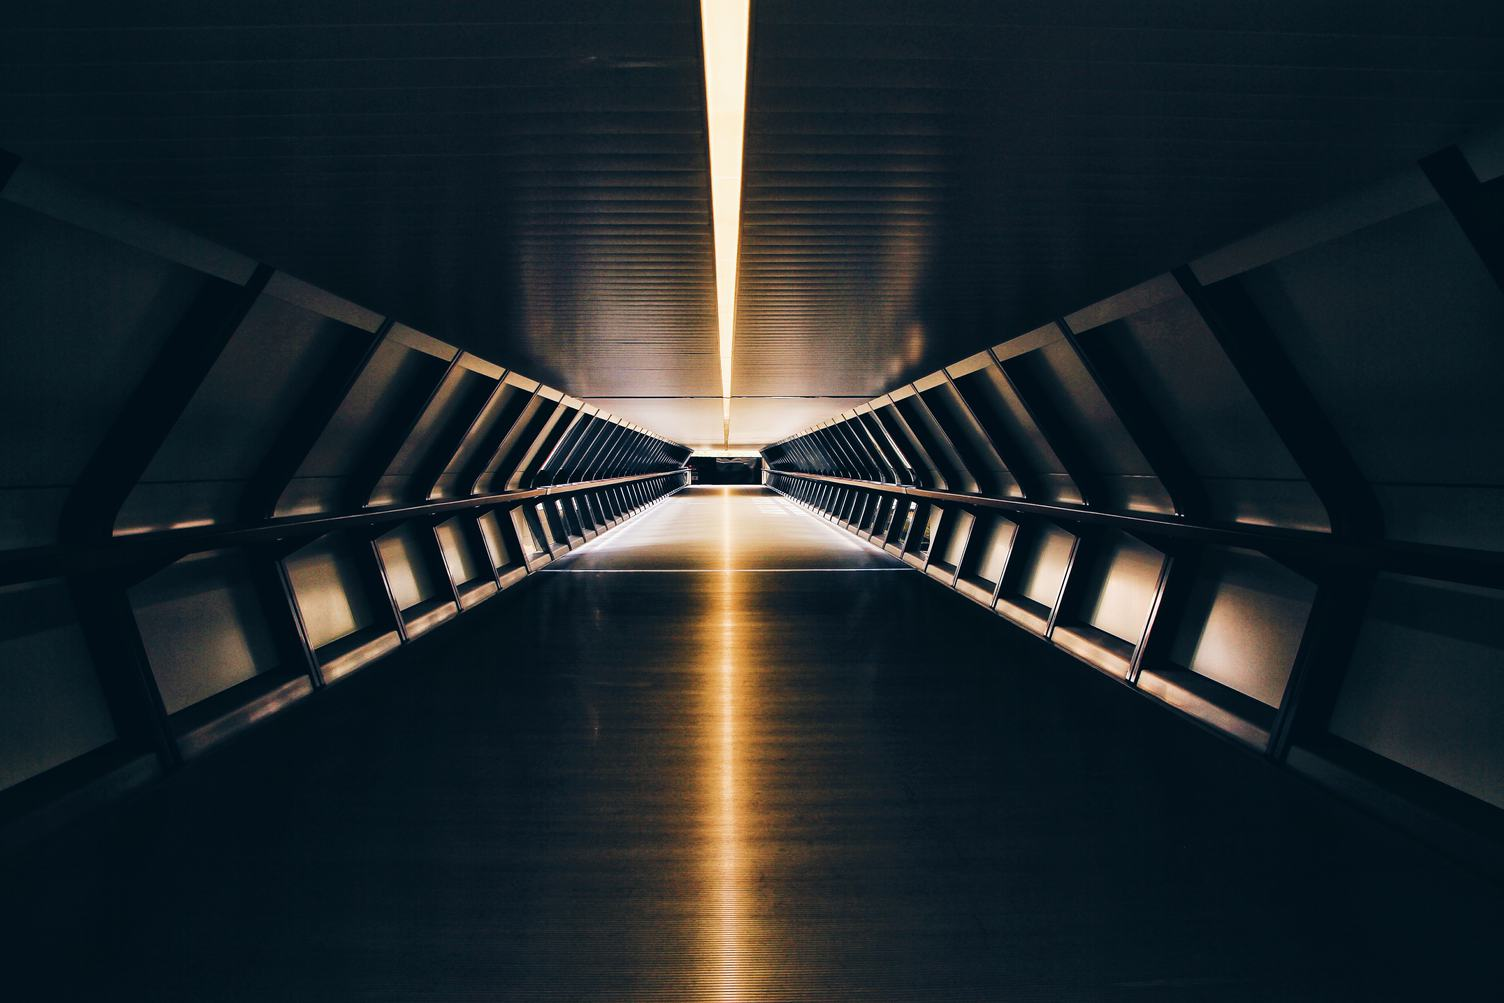 Empty Tunnel for Pedestrians